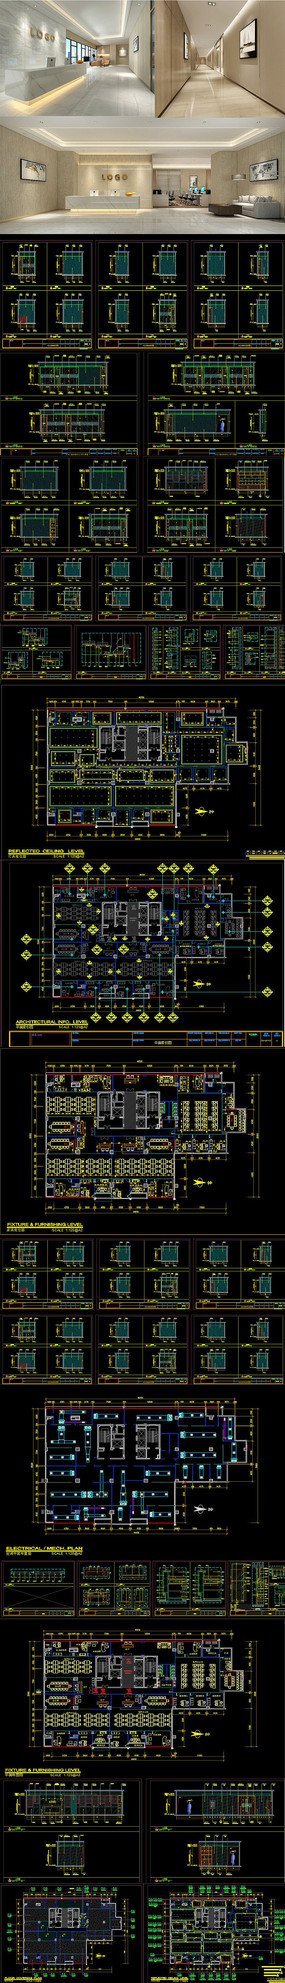 全套办公室CAD施工图 效果图